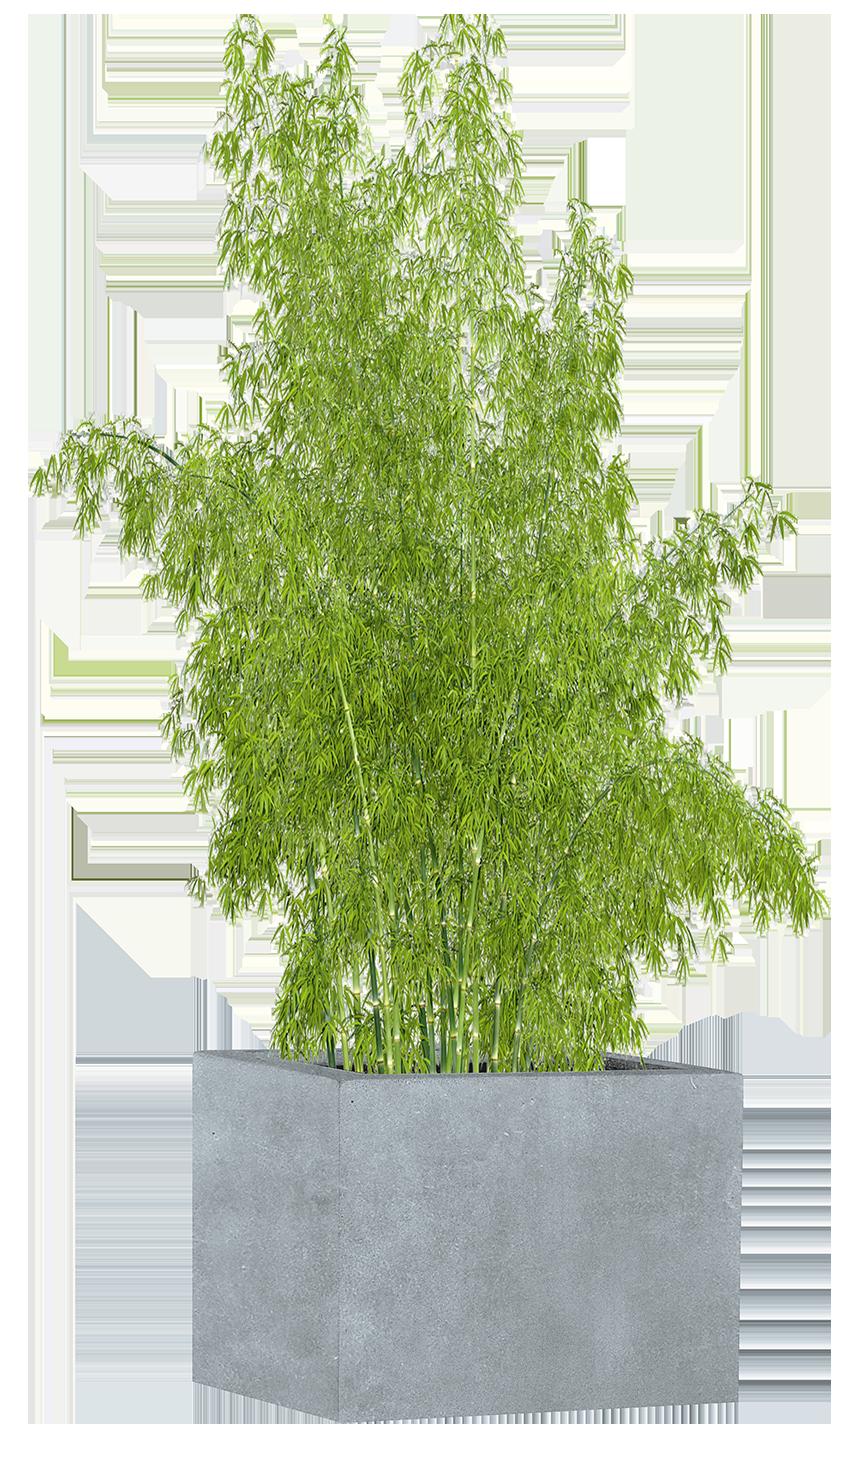 Pflanzgefäß mit Bambus